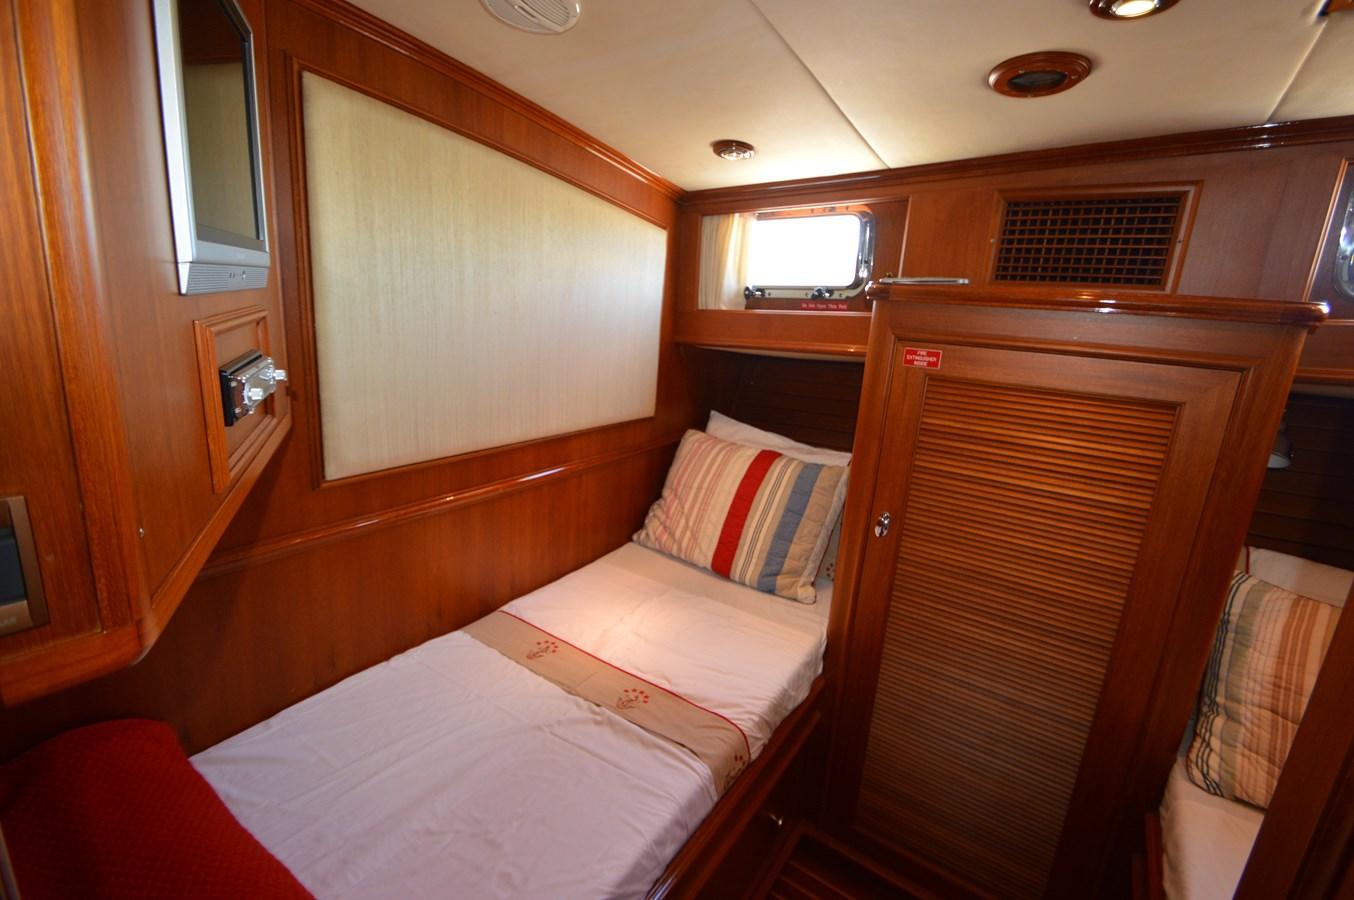 72 2004 GRAND BANKS 58 Eastbay Motor Yacht 2714798